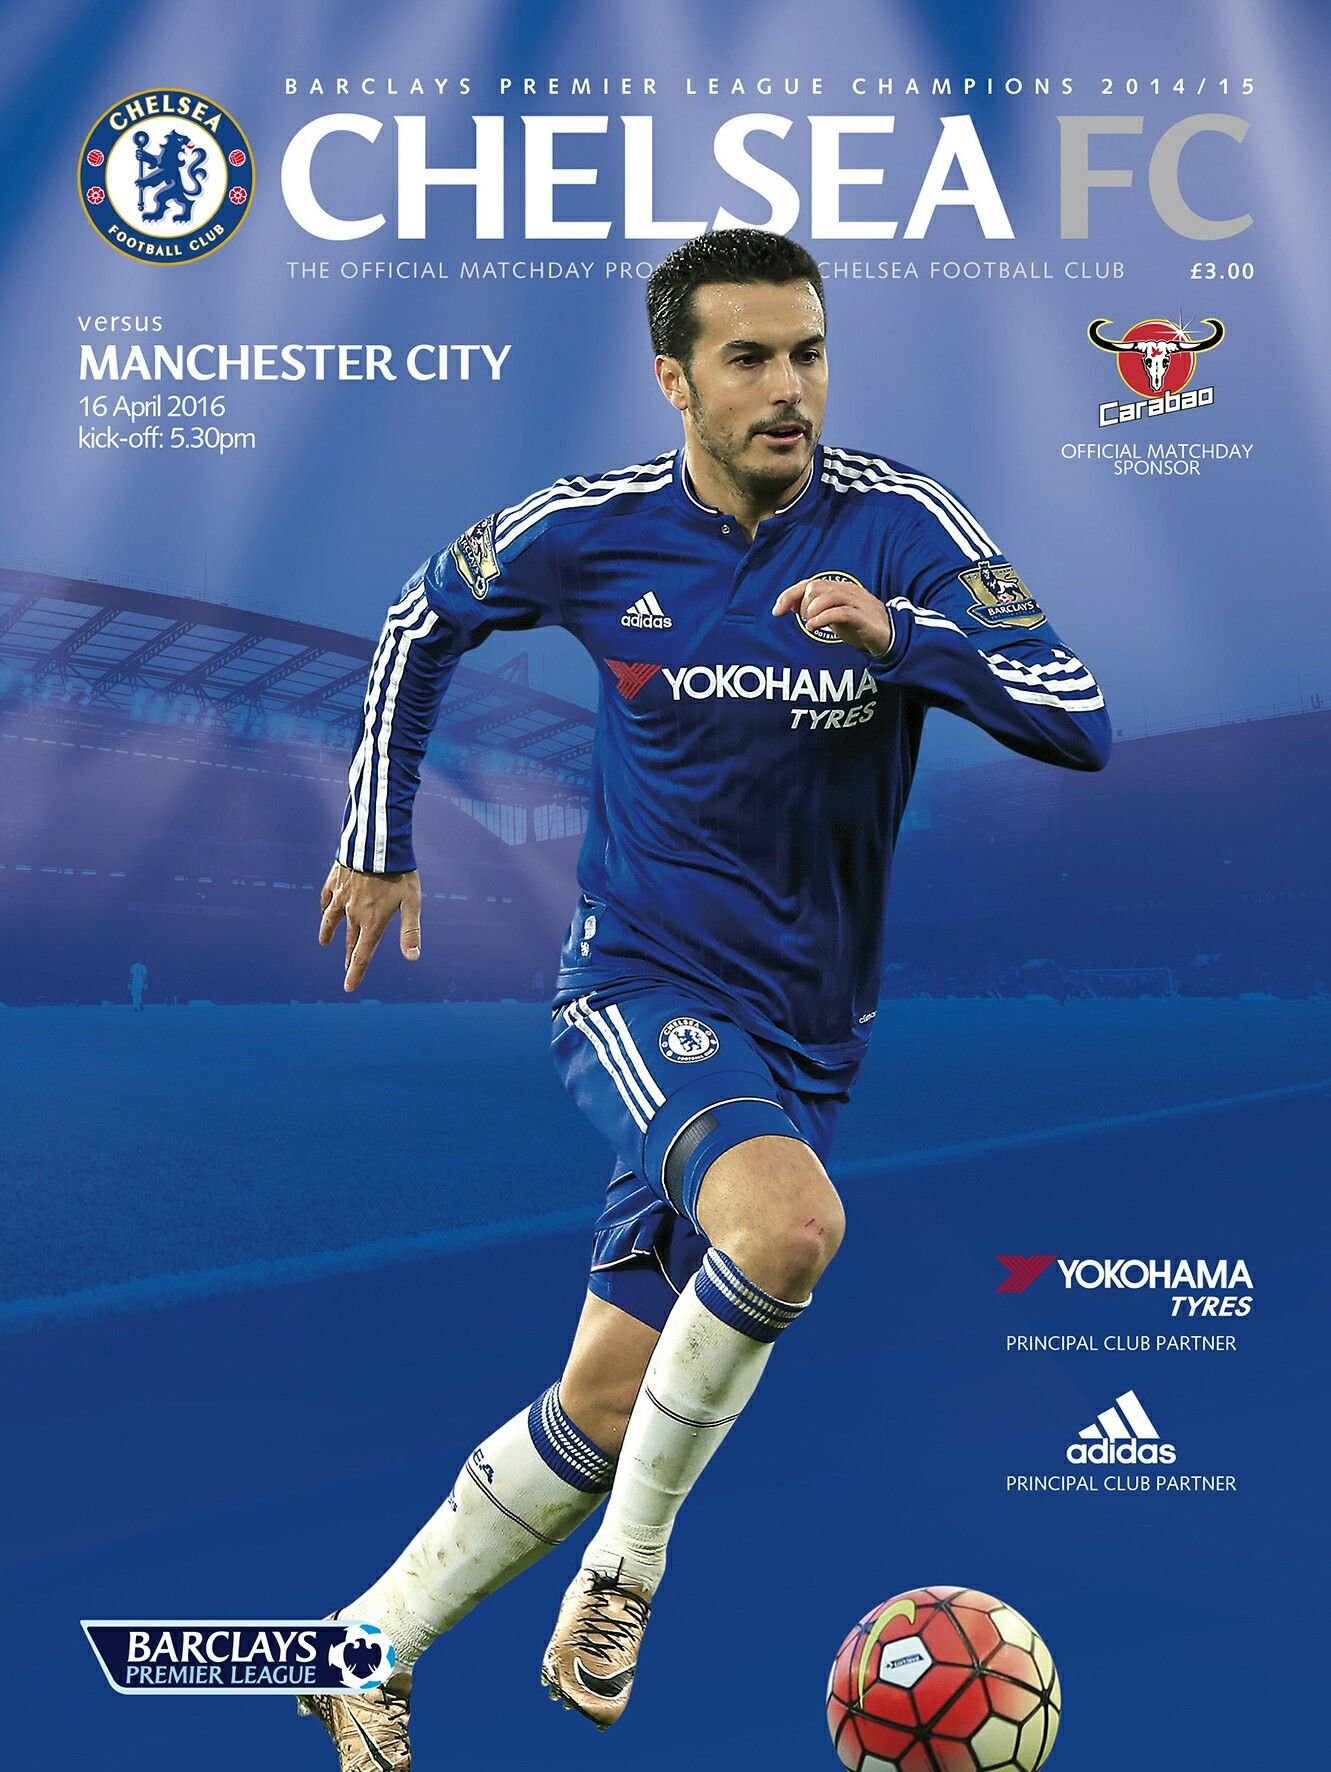 Chelsea 0 Man City 3 in April 2016 at Stamford Bridge. The